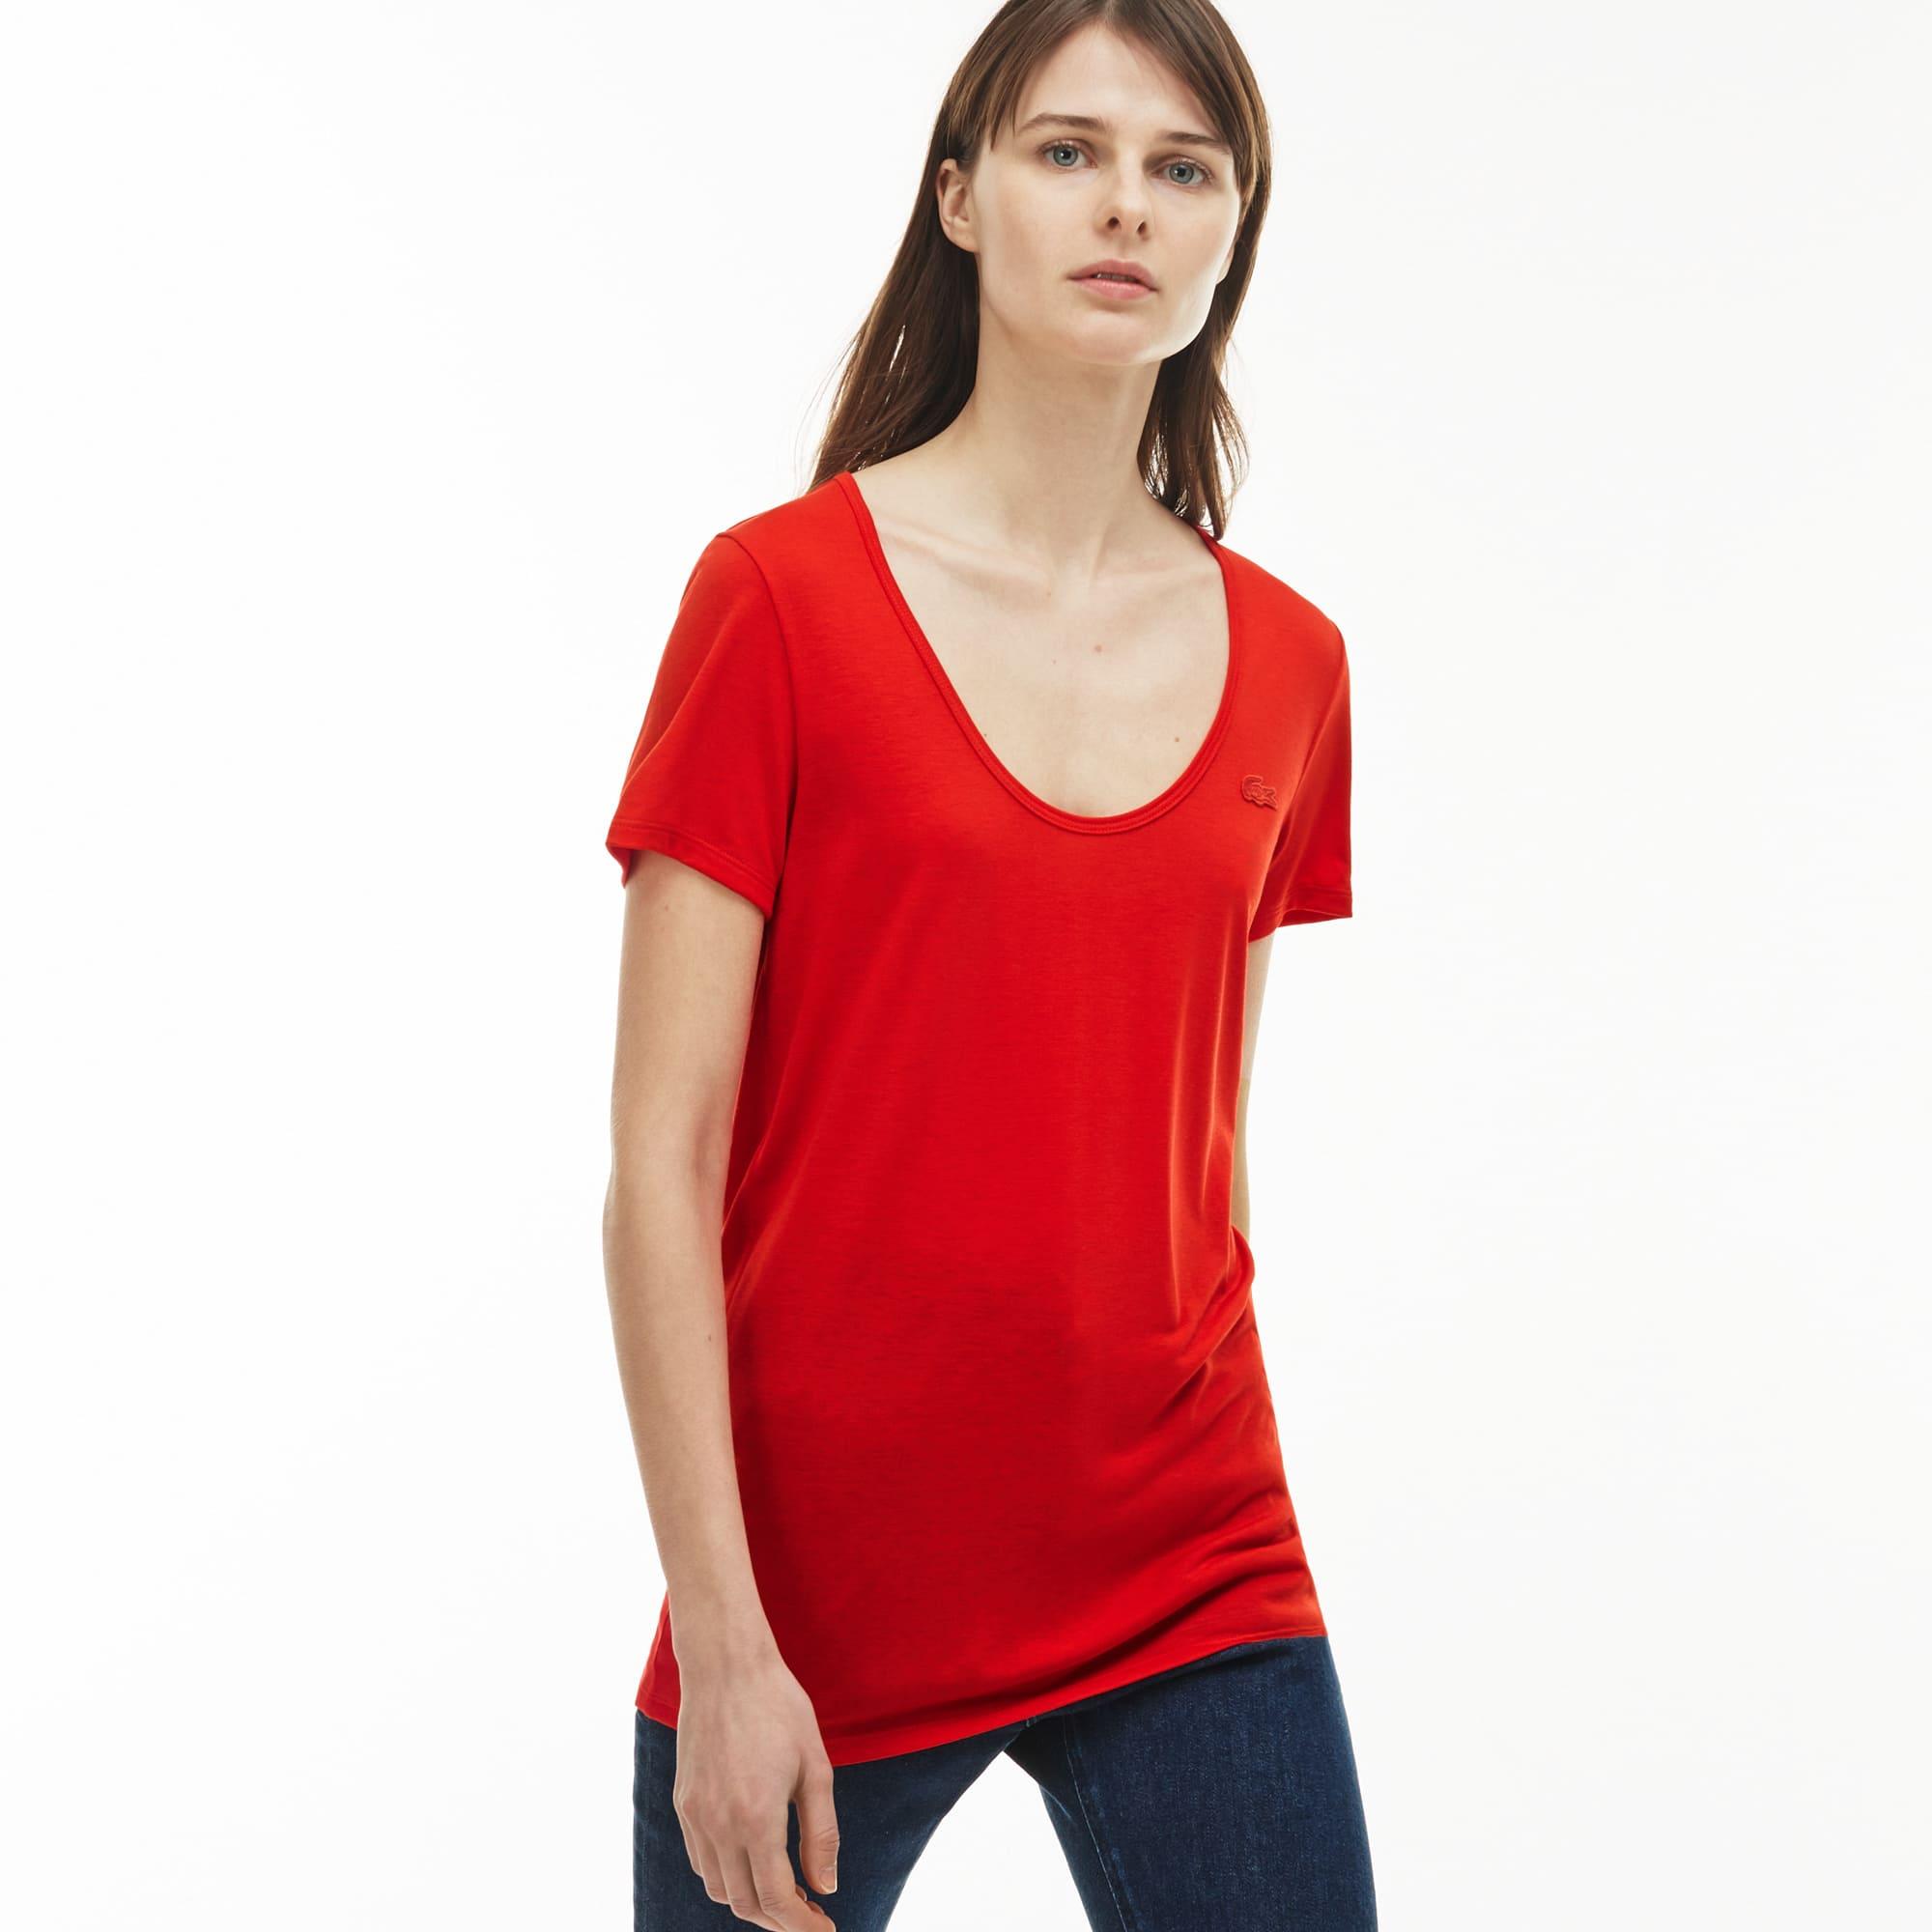 Women's Scoop Neck Flowing Jersey Blend T-shirt